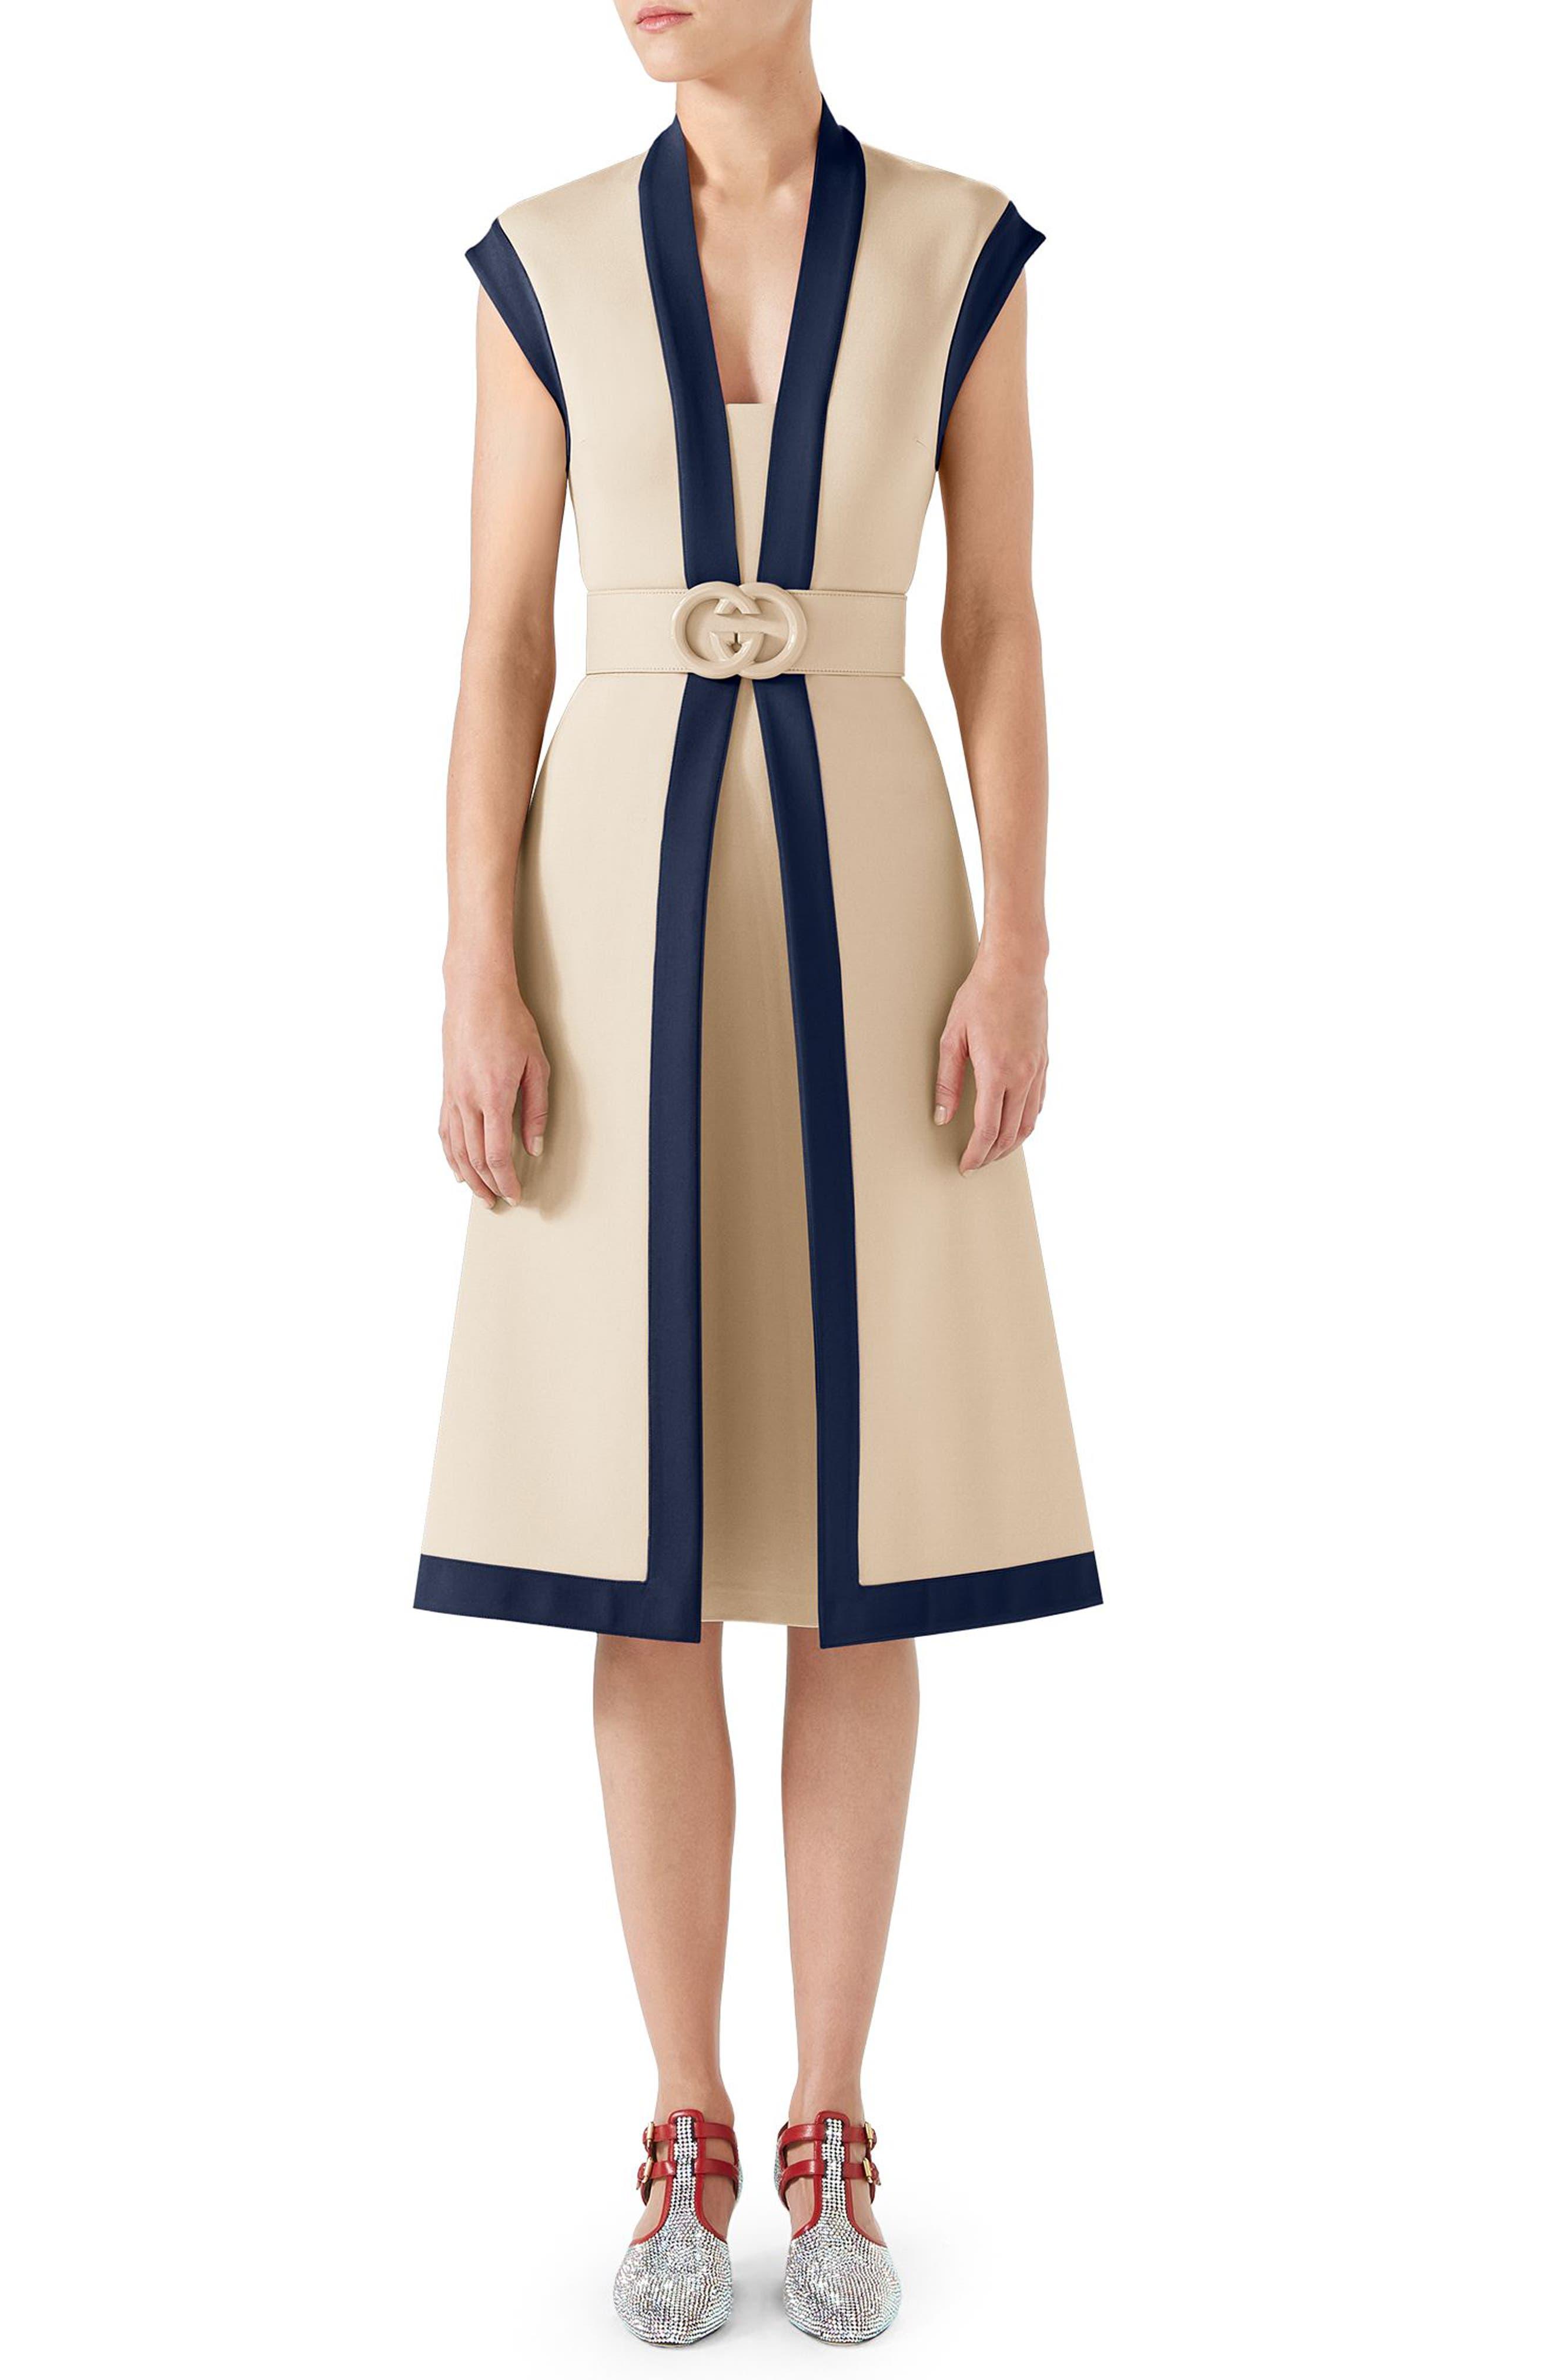 Contrast Trim Belted Dress,                             Main thumbnail 1, color,                             Almond Flower/ Royal